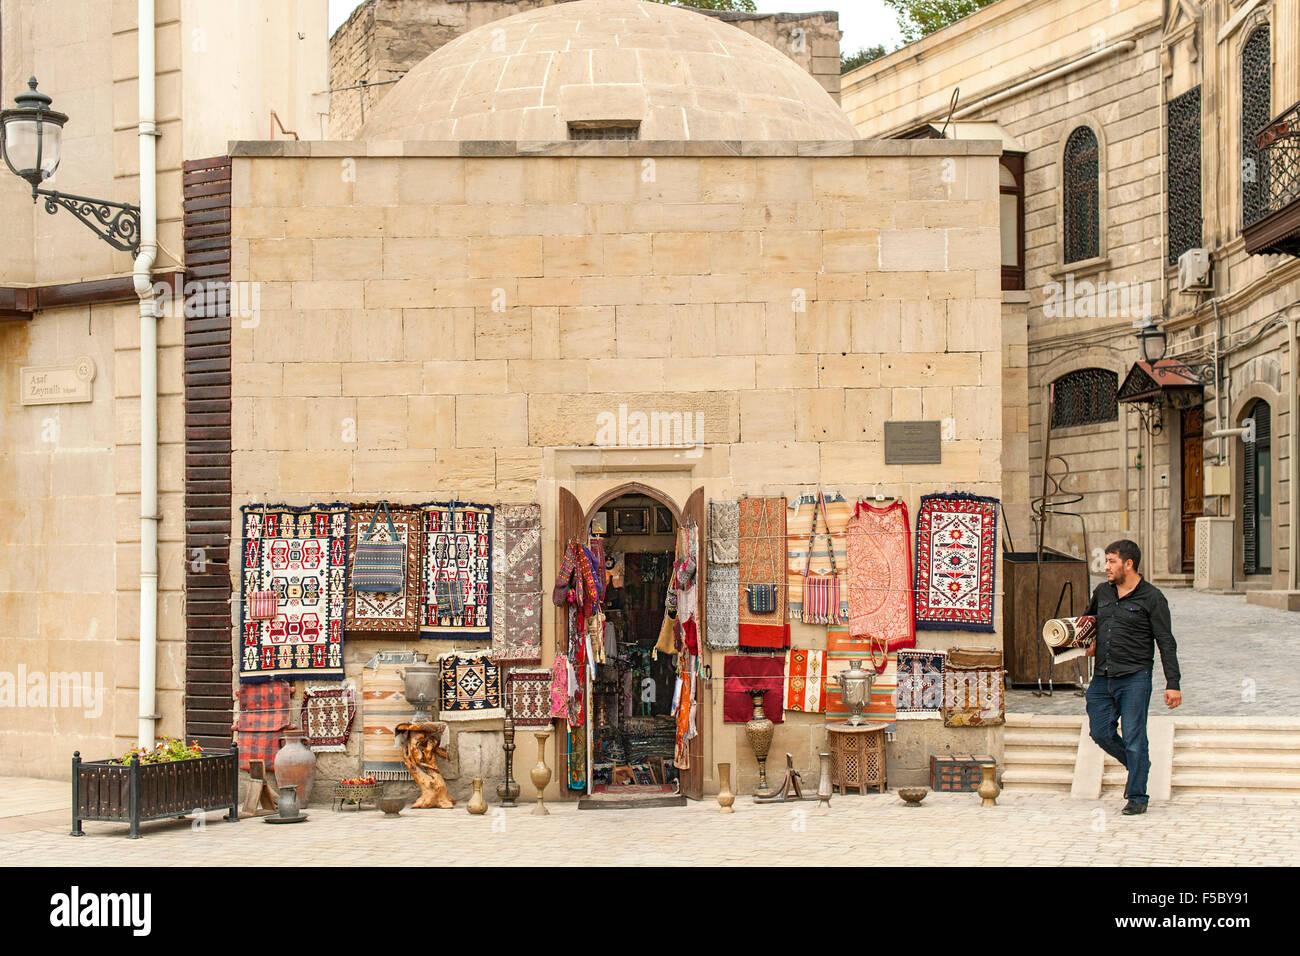 Curio shop in the Old Town (İcheri Sheher) in Baku, capital of Azerbaijan. - Stock Image